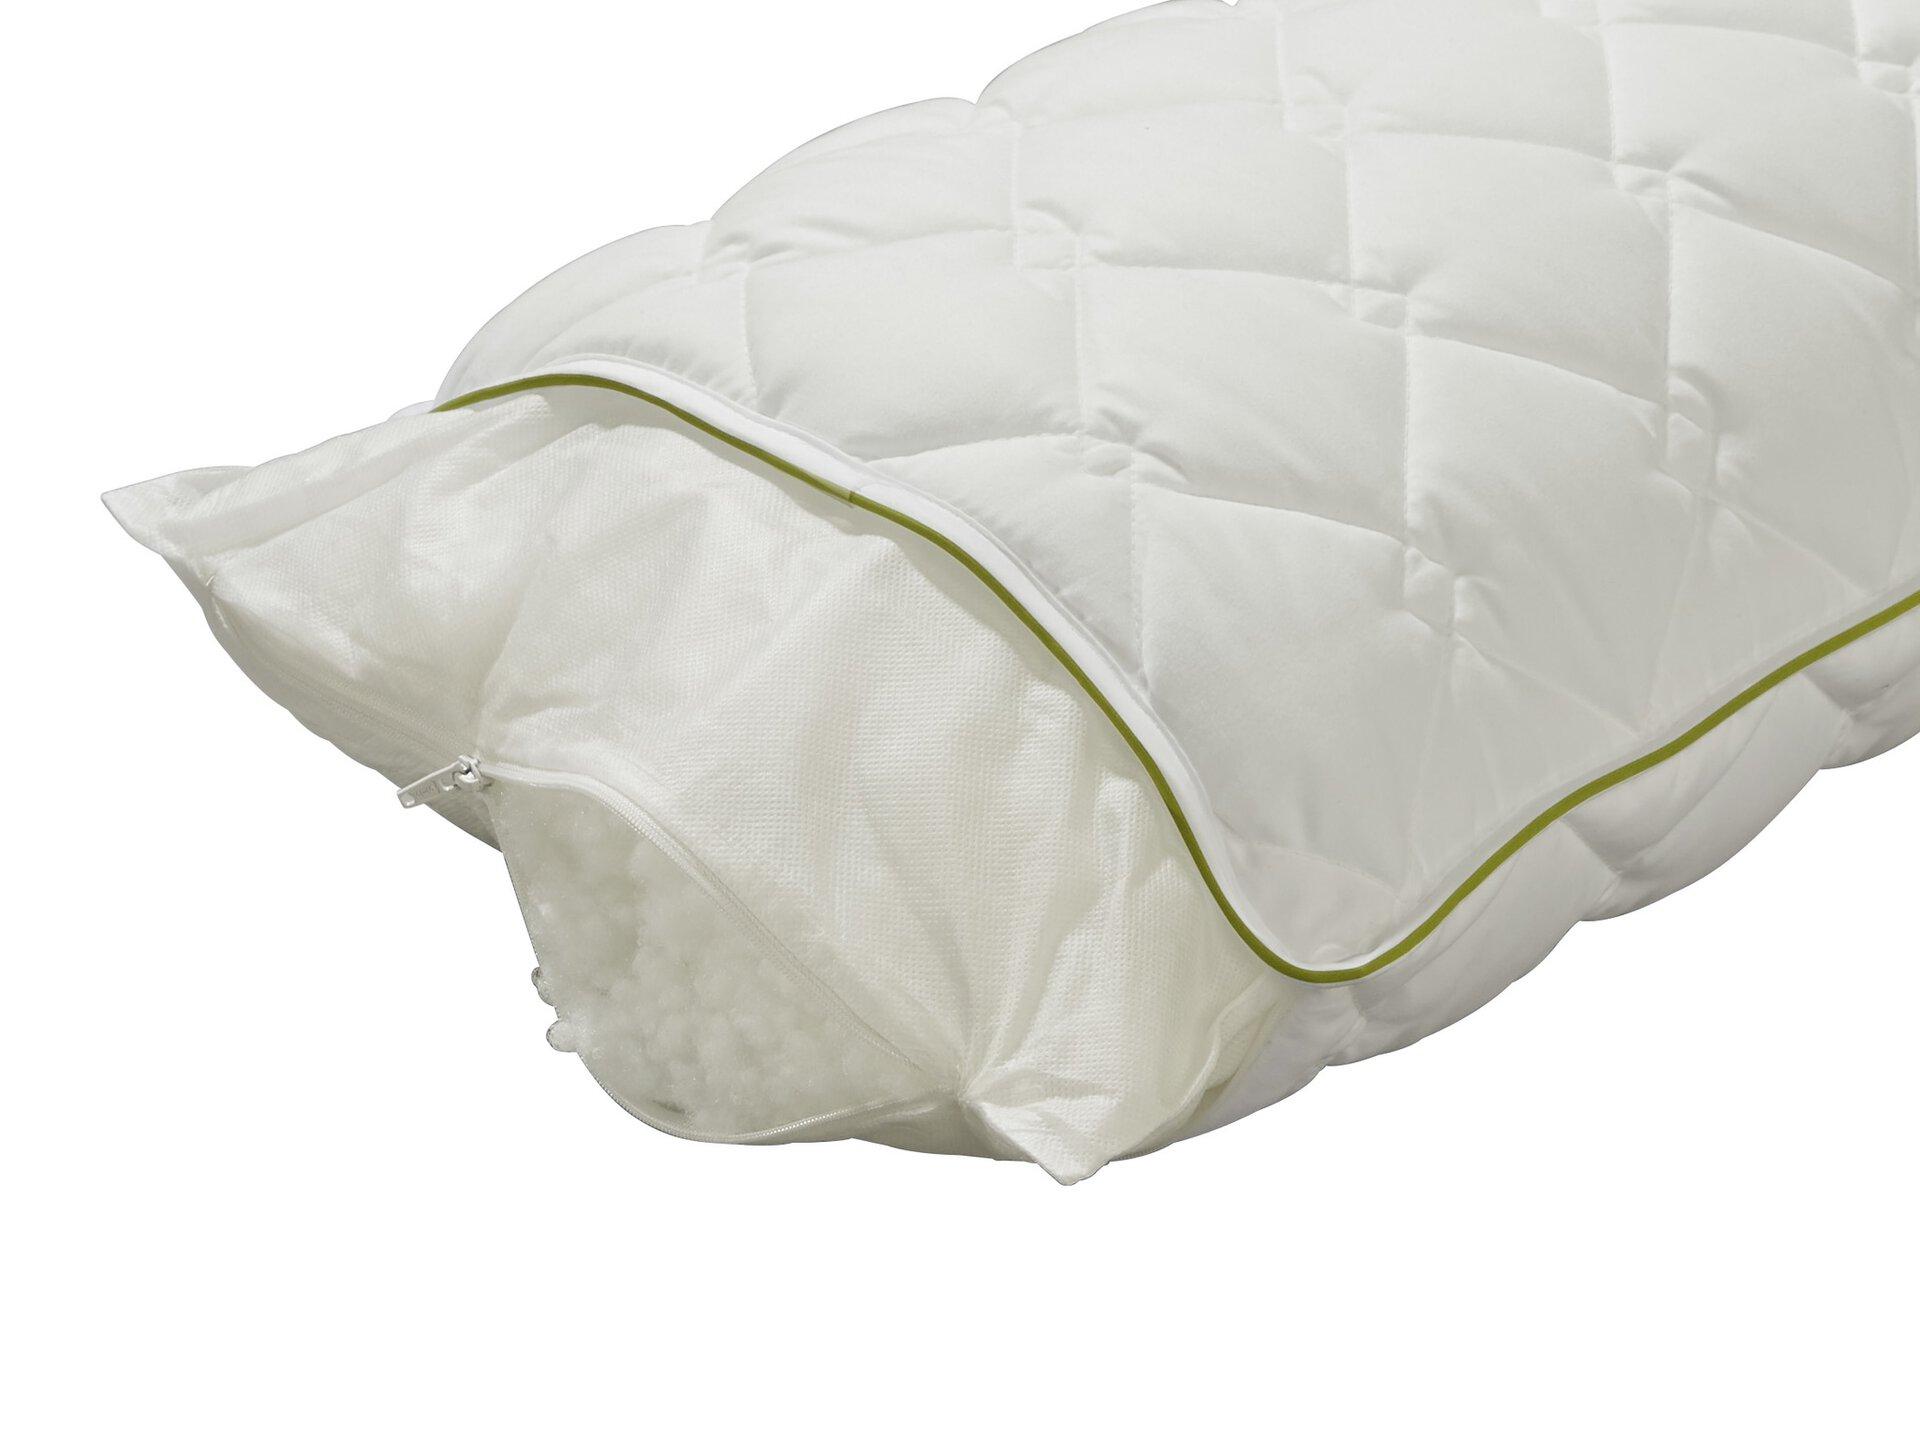 Kopfkissen Cyclafill ECO Badenia Irisette Greenline Textil weiß 40 x 80 cm